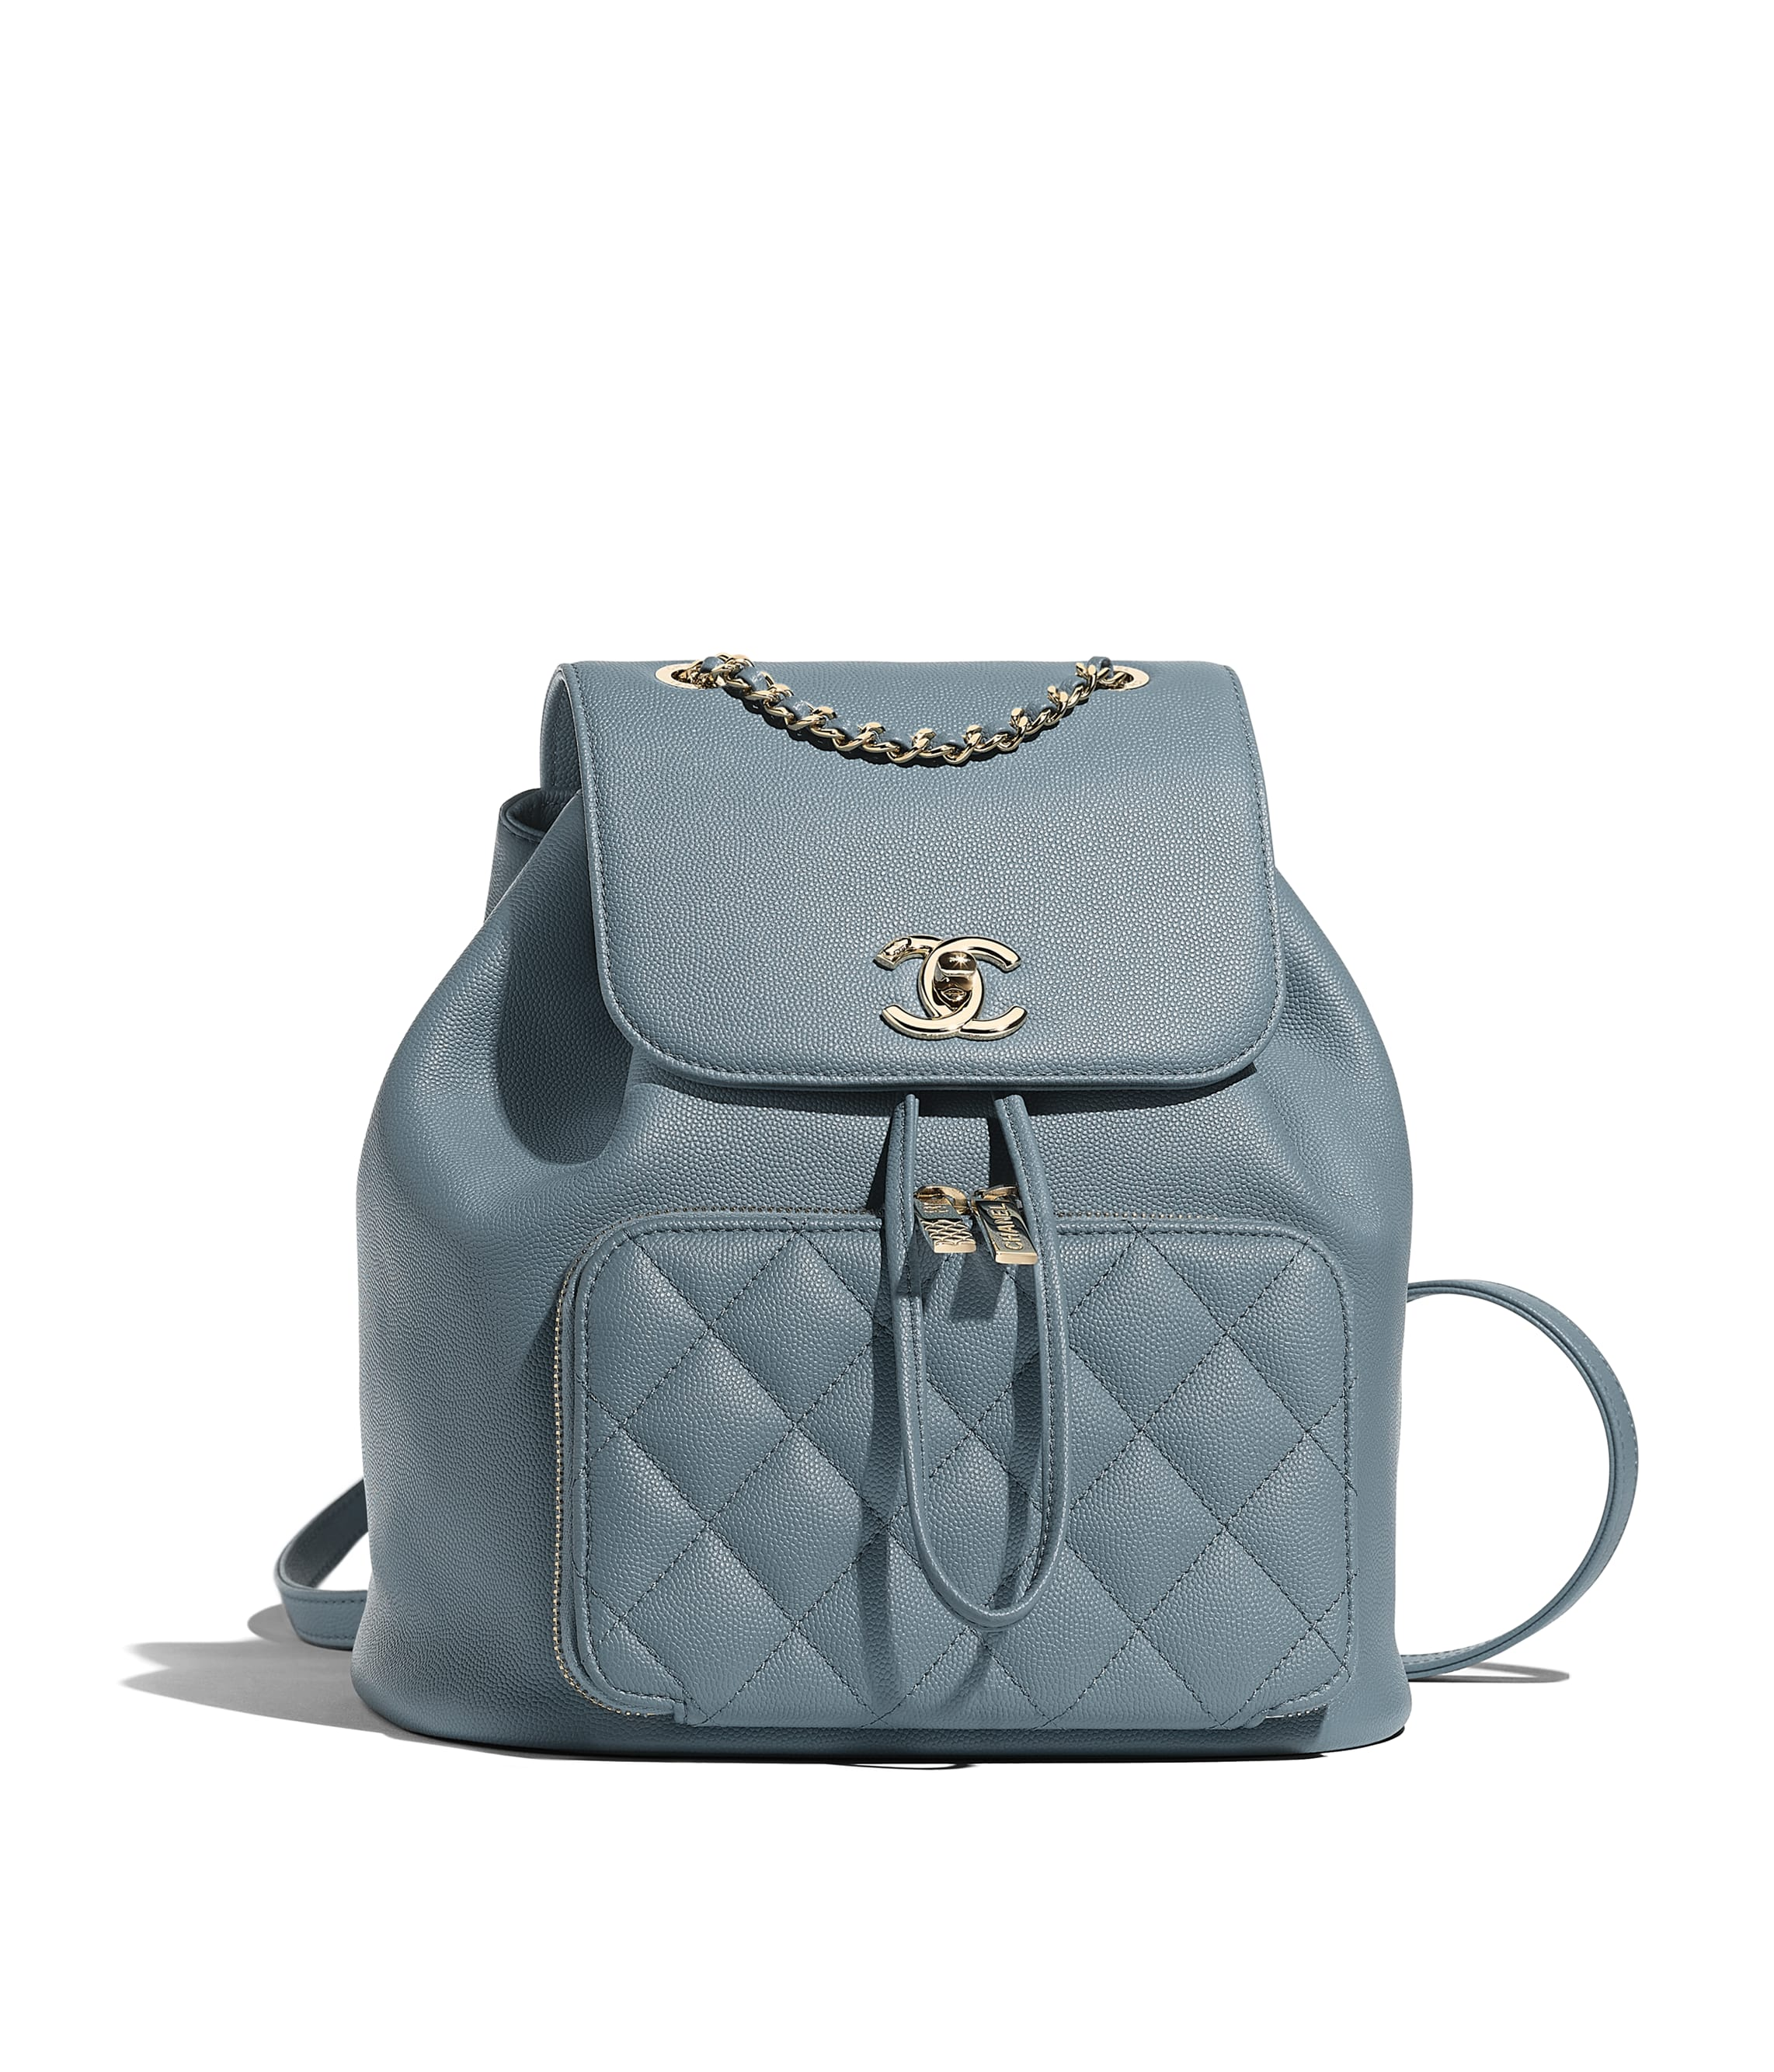 Backpacks - Handbags - CHANEL 24a135dd6d0d2